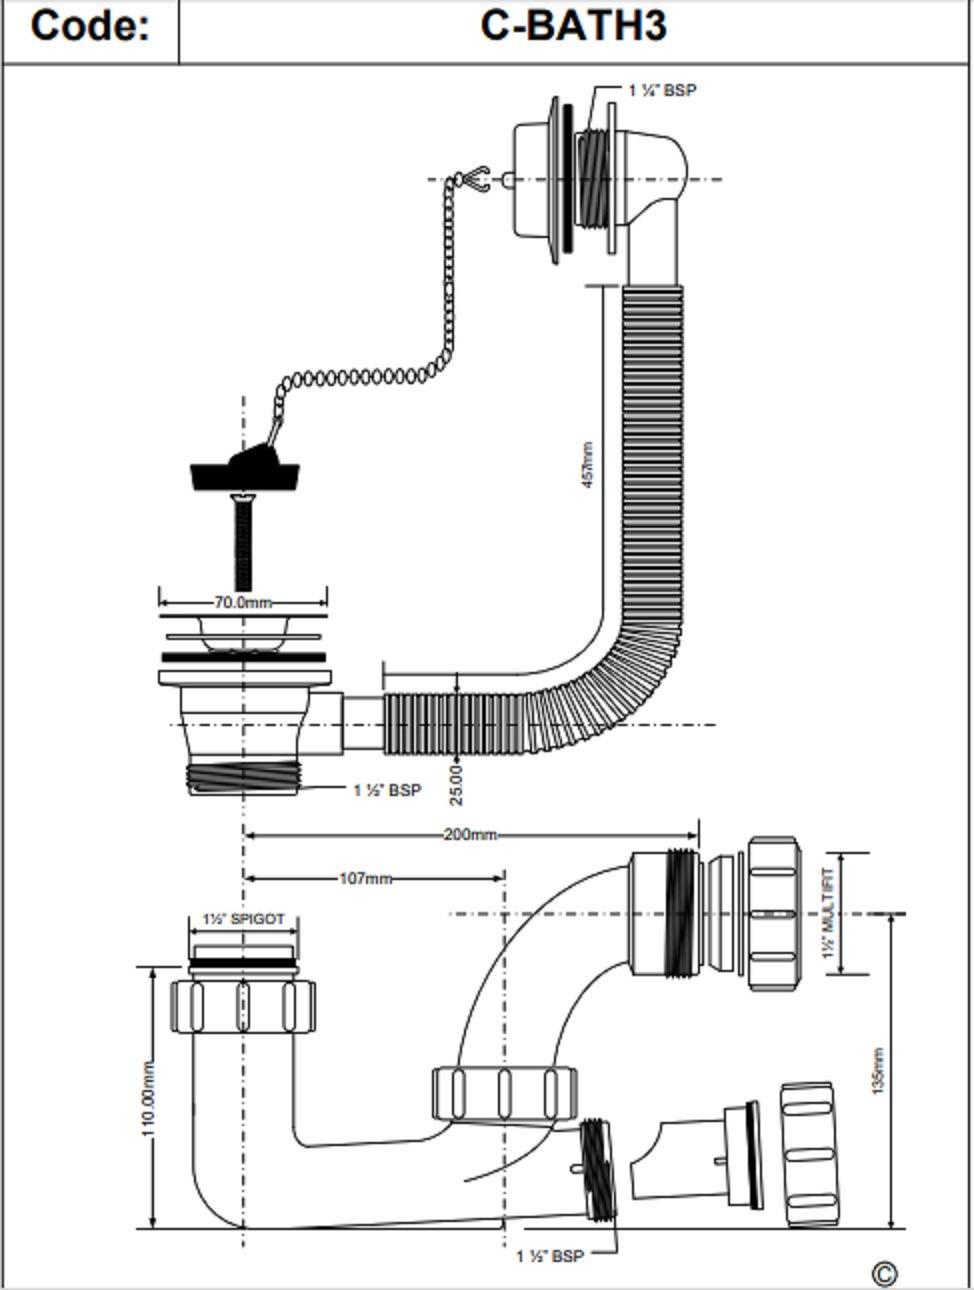 75mm Seal Bath Trap McAlpine C-Bath 3 Waste and Overflow